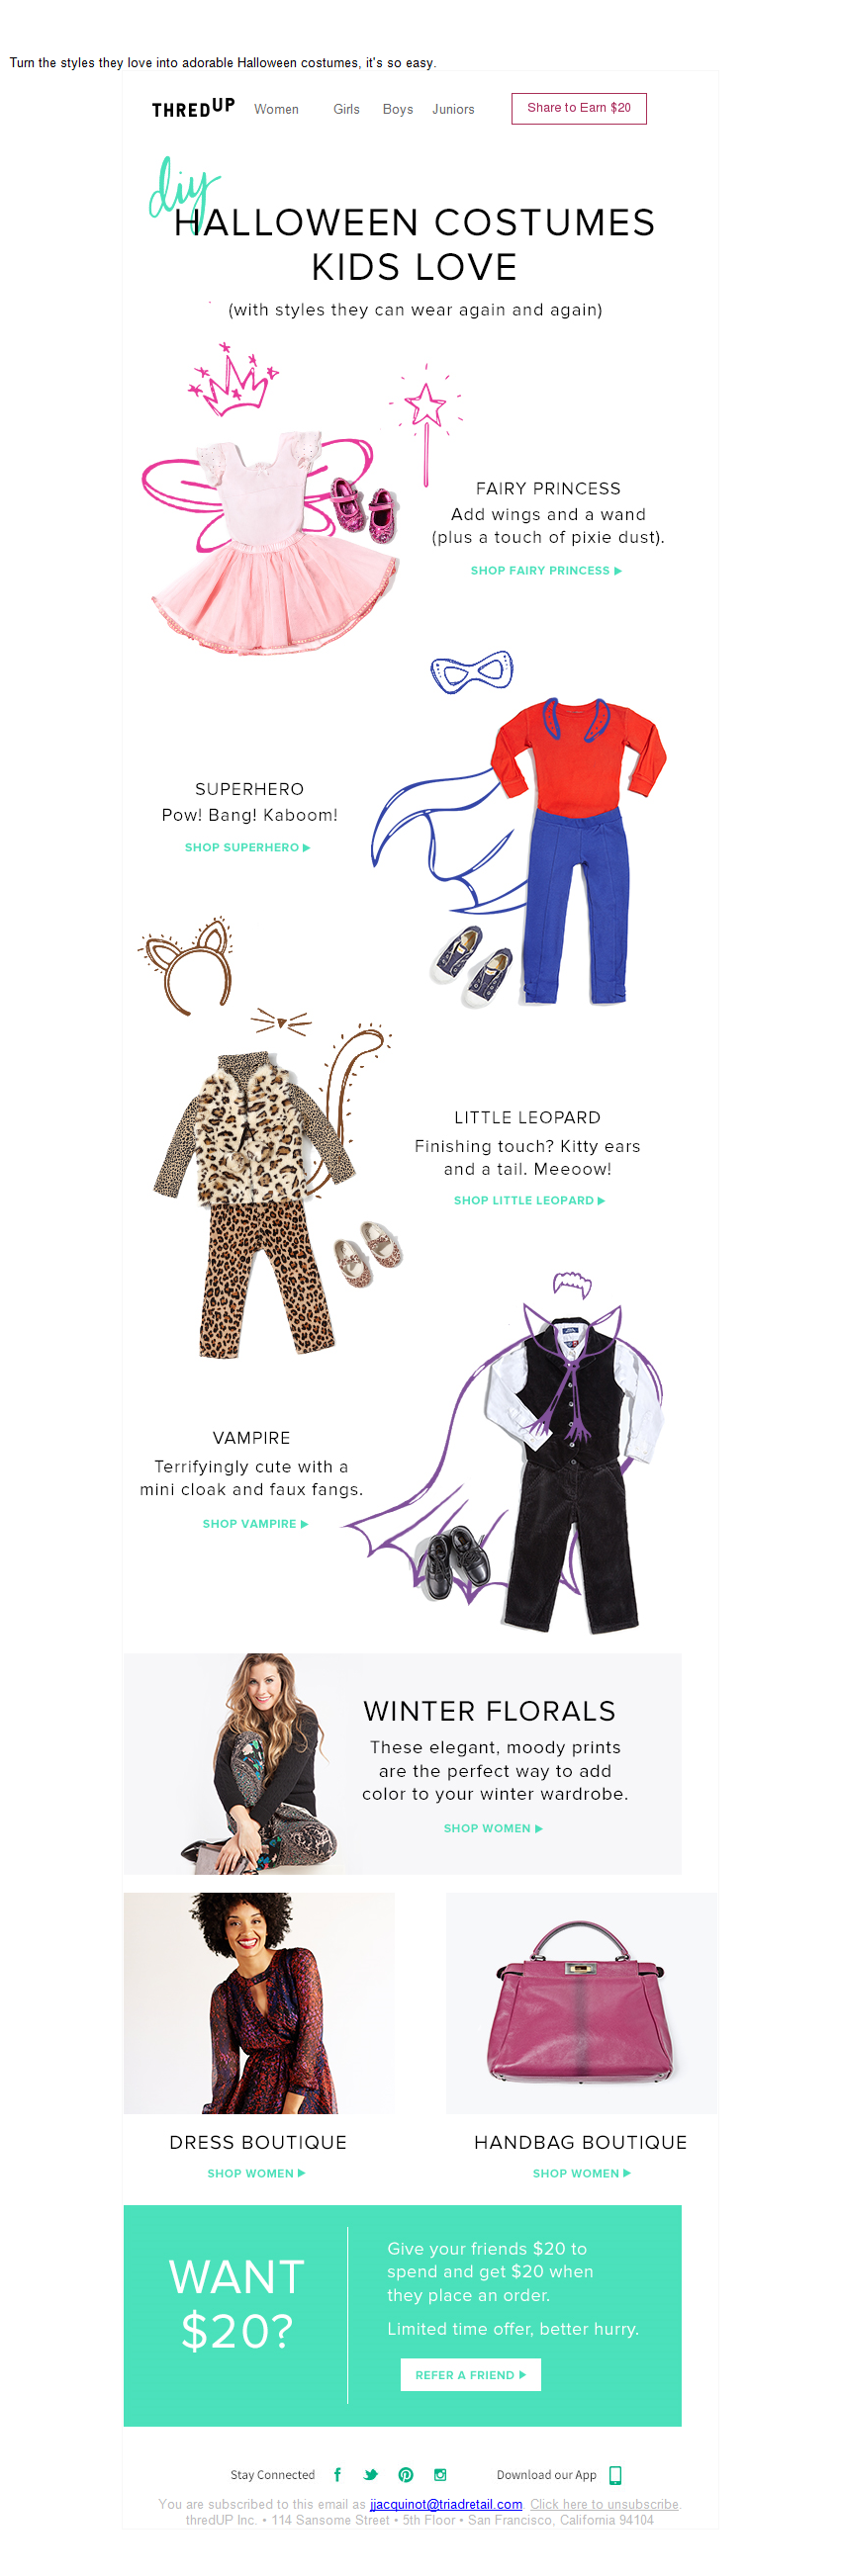 ThredUp Halloween Email // DIY: Halloween Costumes Kids Love // Sent 10-07-2015 6:42 AM